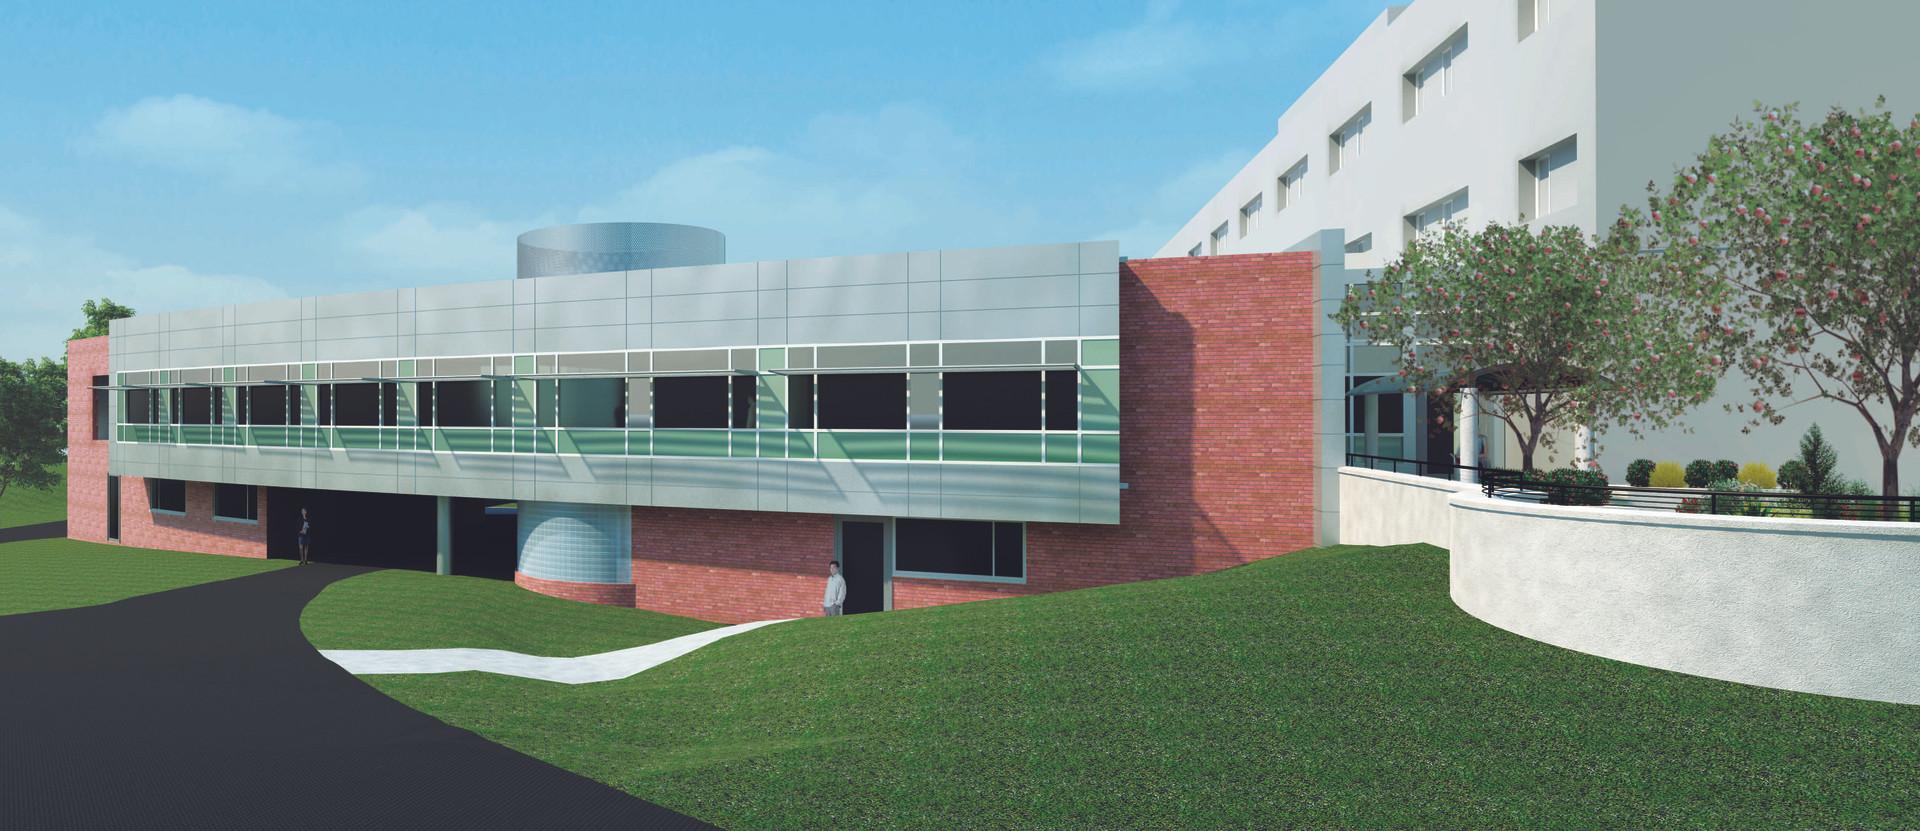 St Camillus Traumatic Brain Injury Facility - Exterior Rendering